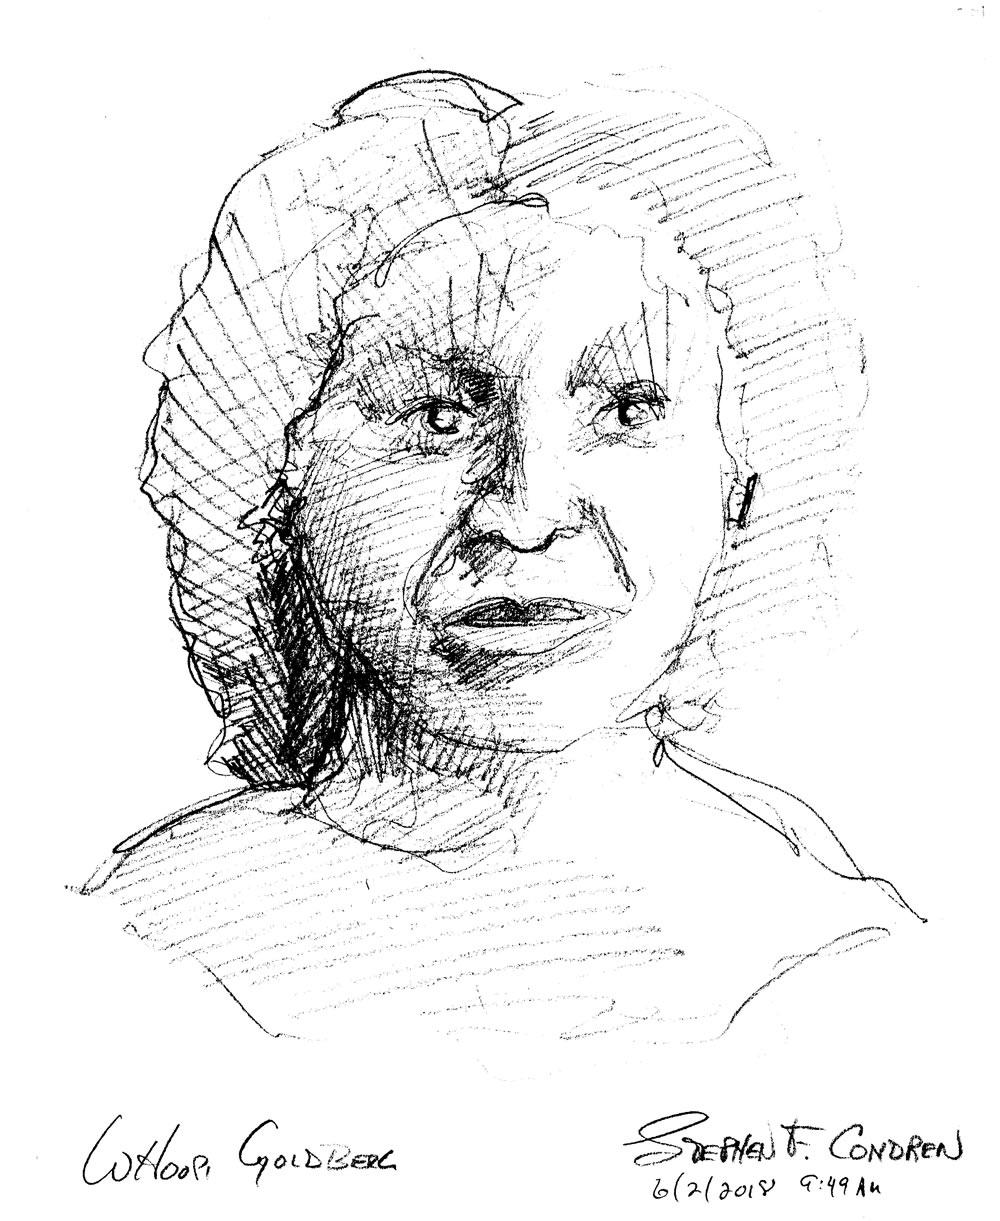 Whoopi Goldberg celebrity art Pencil Drawing By Stephen F. Condren